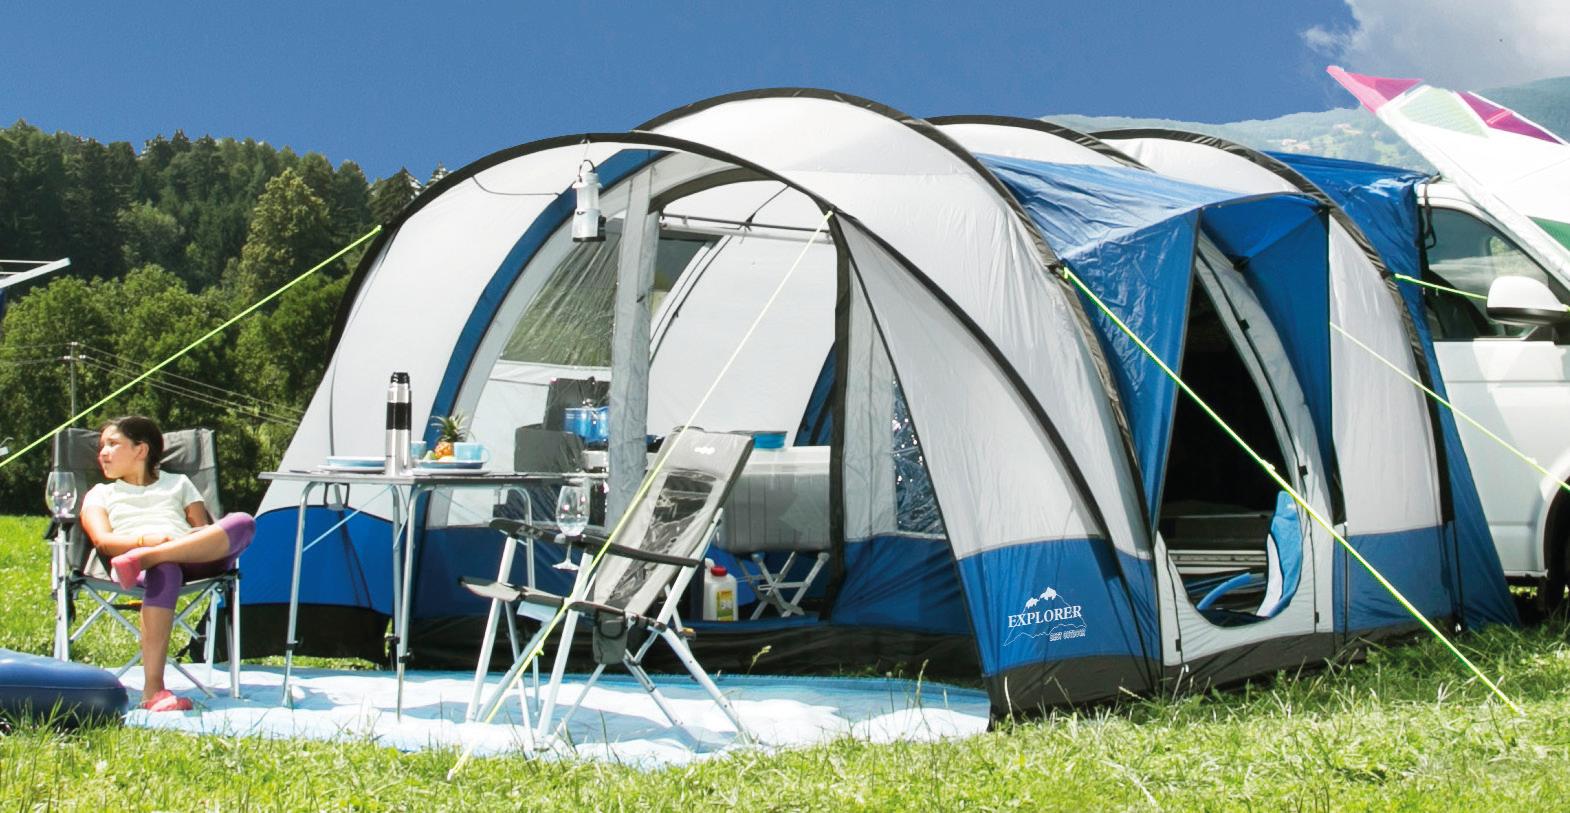 campingbus zelt camping urlaub wohnwagen campingbus. Black Bedroom Furniture Sets. Home Design Ideas